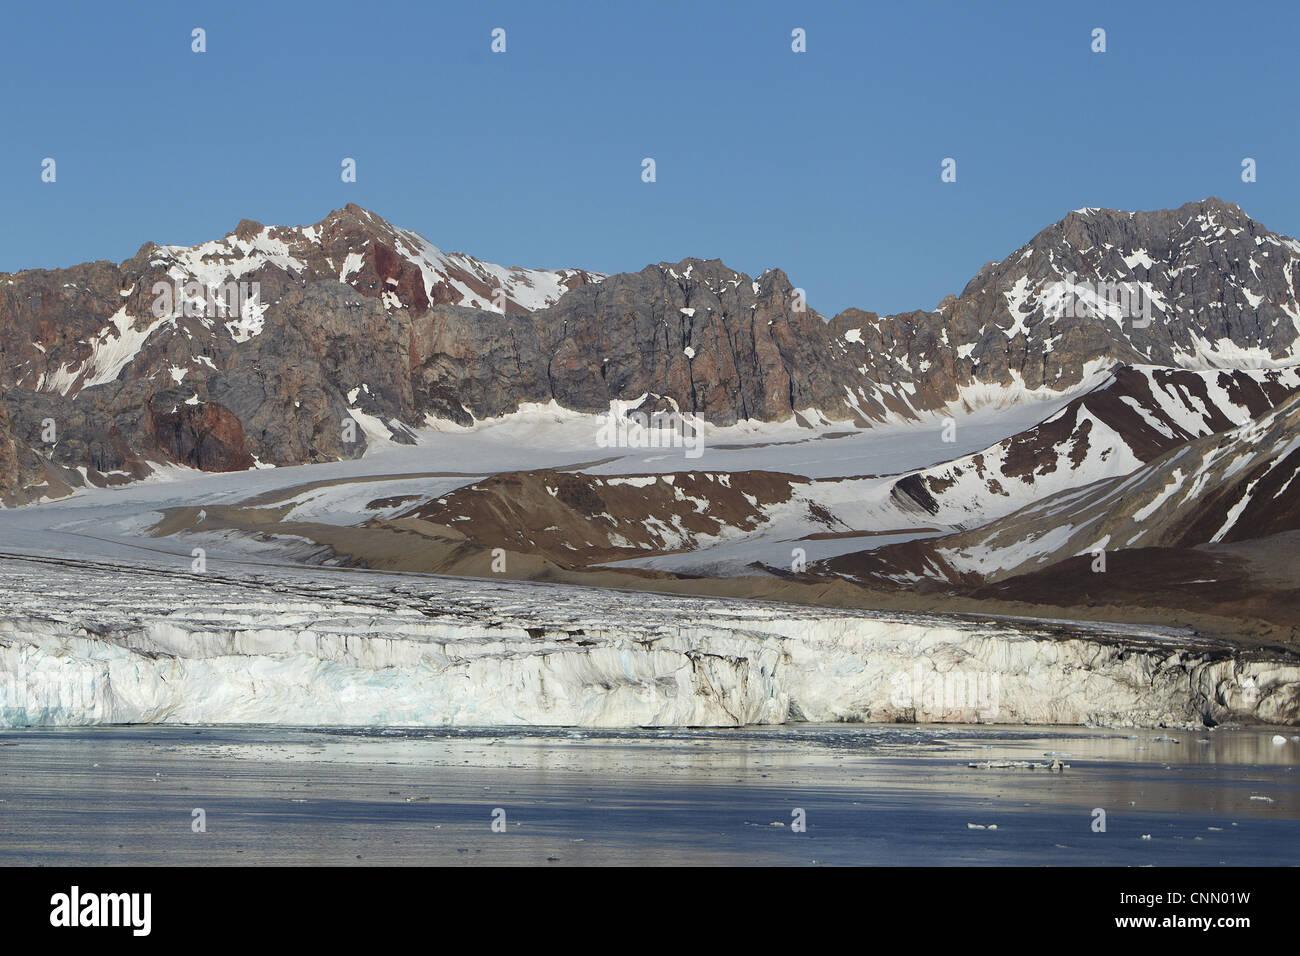 View of coastal glacier terminus, Fourteenth July Glacier, Spitsbergen, Svalbard - Stock Image